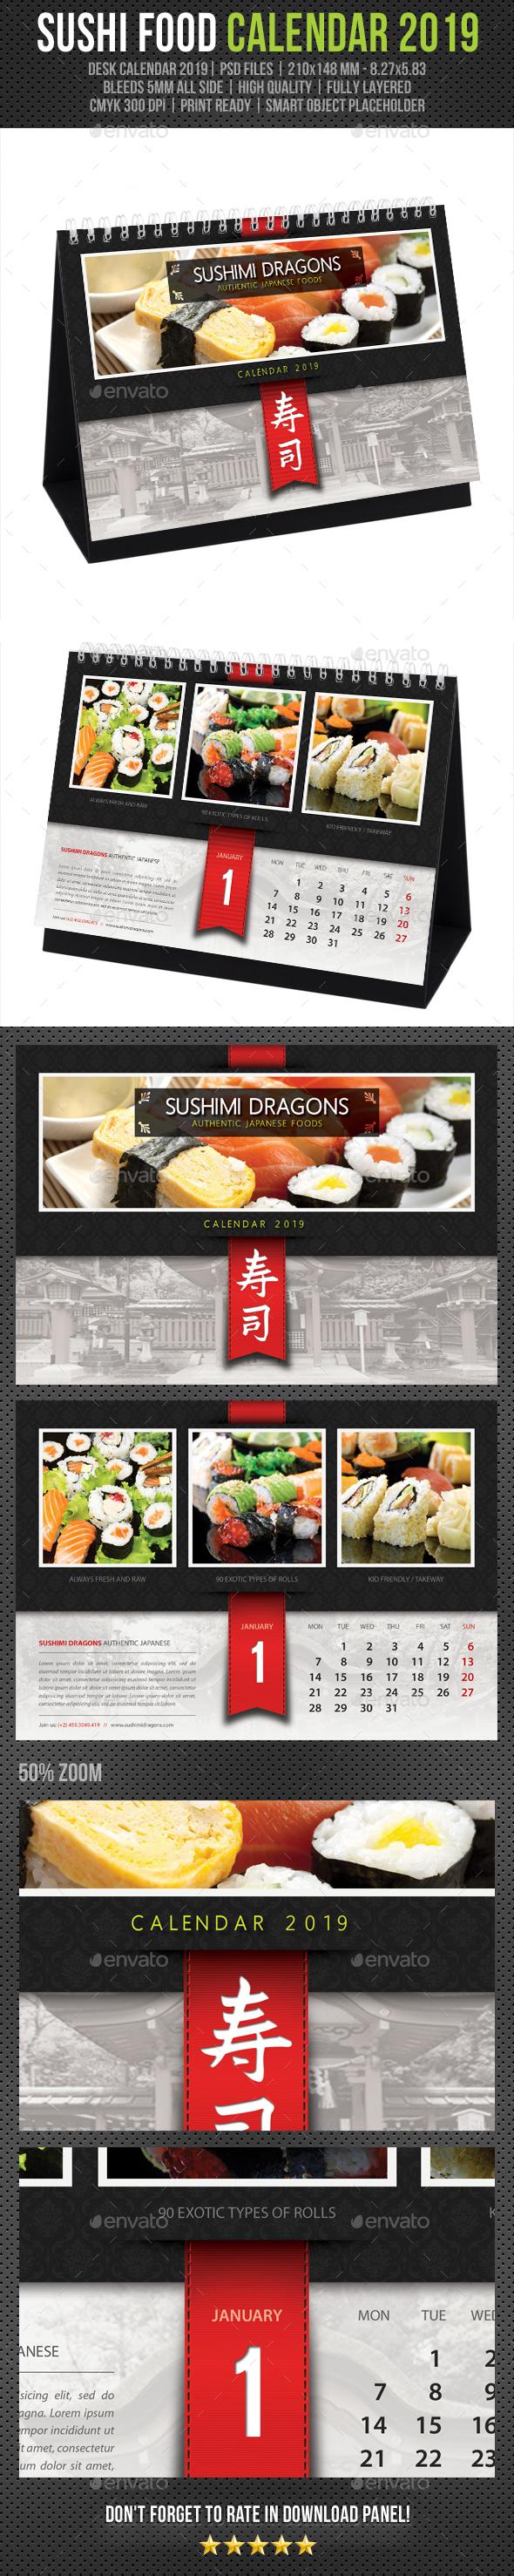 Sushi Restaurant Desk Calendar 2019 - Calendars Stationery